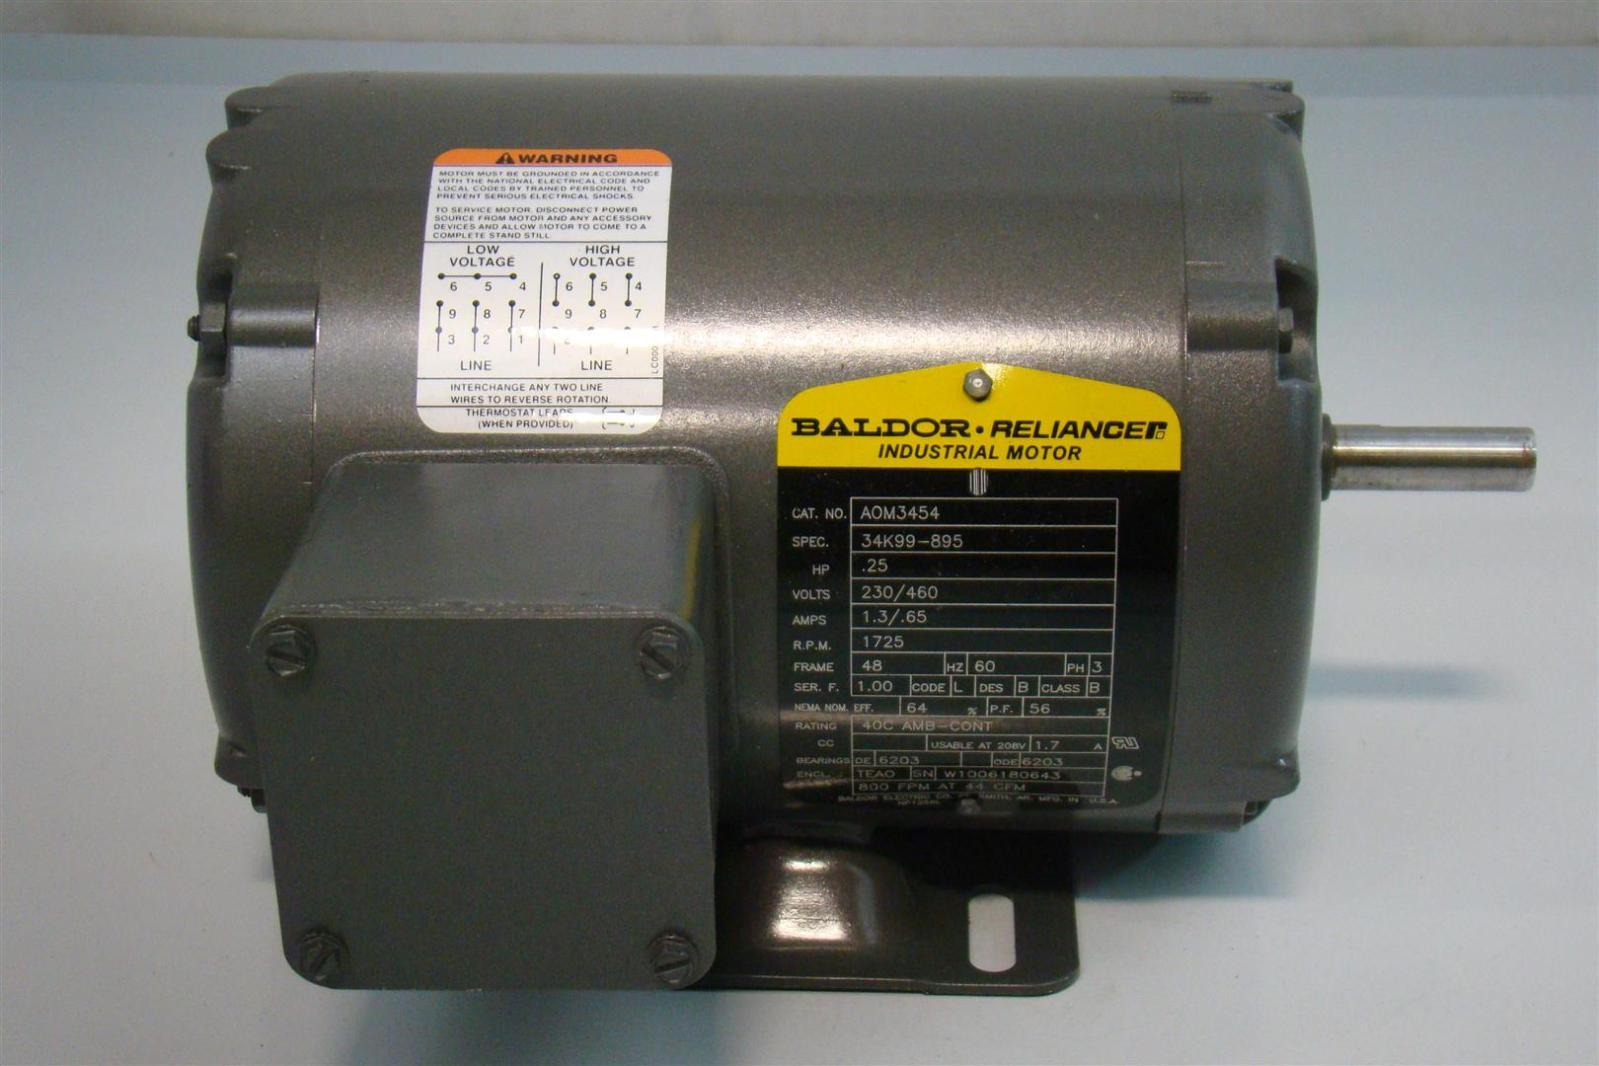 afe126 baldor reliance industrial motor 25hp 13 65amps 1725rpm 60hz aom3454?resize\\\=665%2C443 baldor 460v wiring diagram wiring diagrams  at suagrazia.org